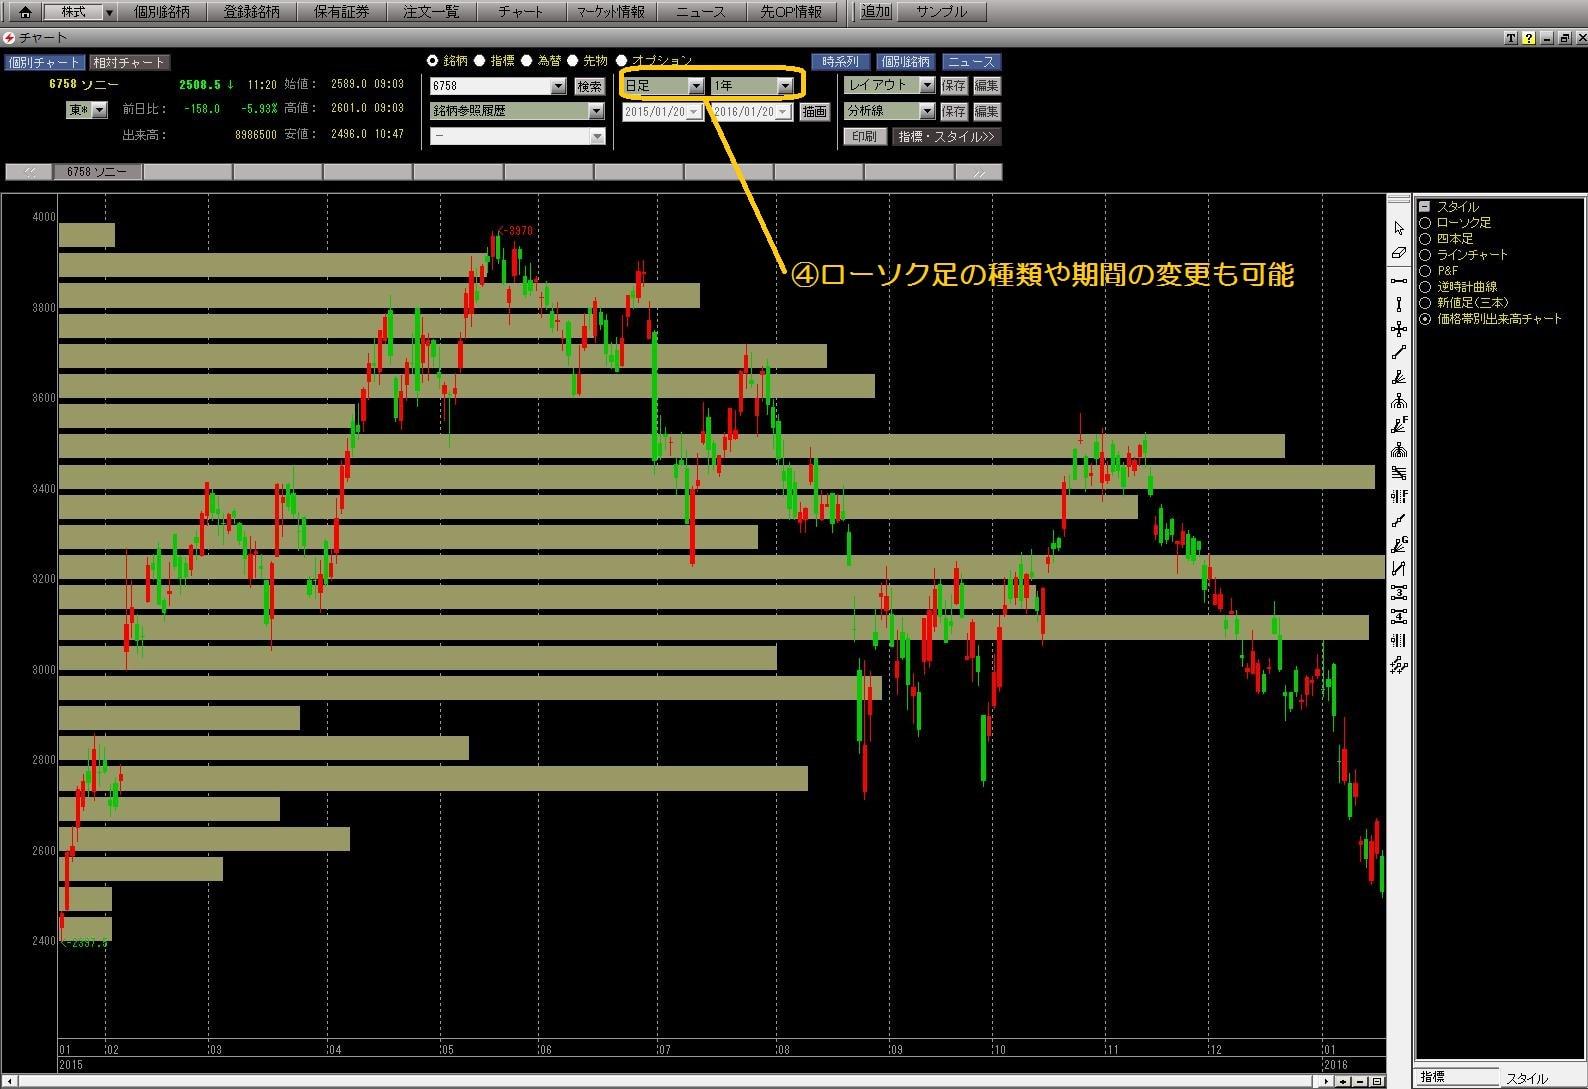 16.1.20SBI証券-価格帯別出来高チャート表示3-min